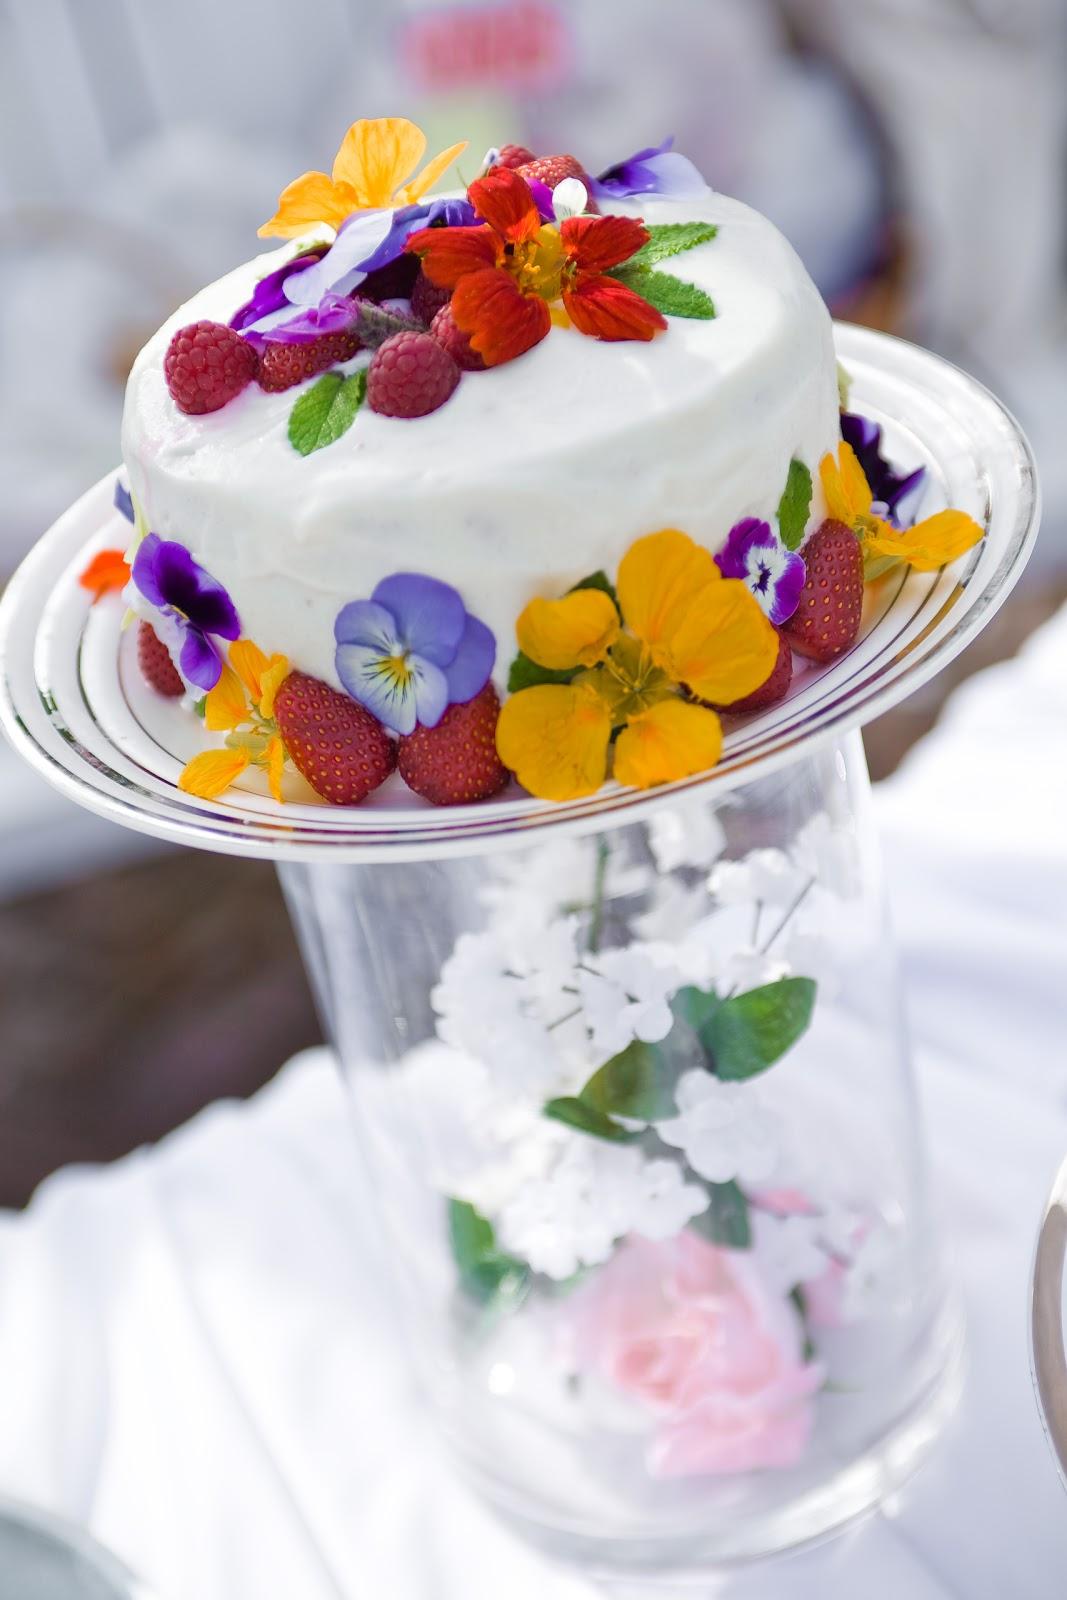 Lois Miller's Greenspeak: Eat Your Flowers Everyday